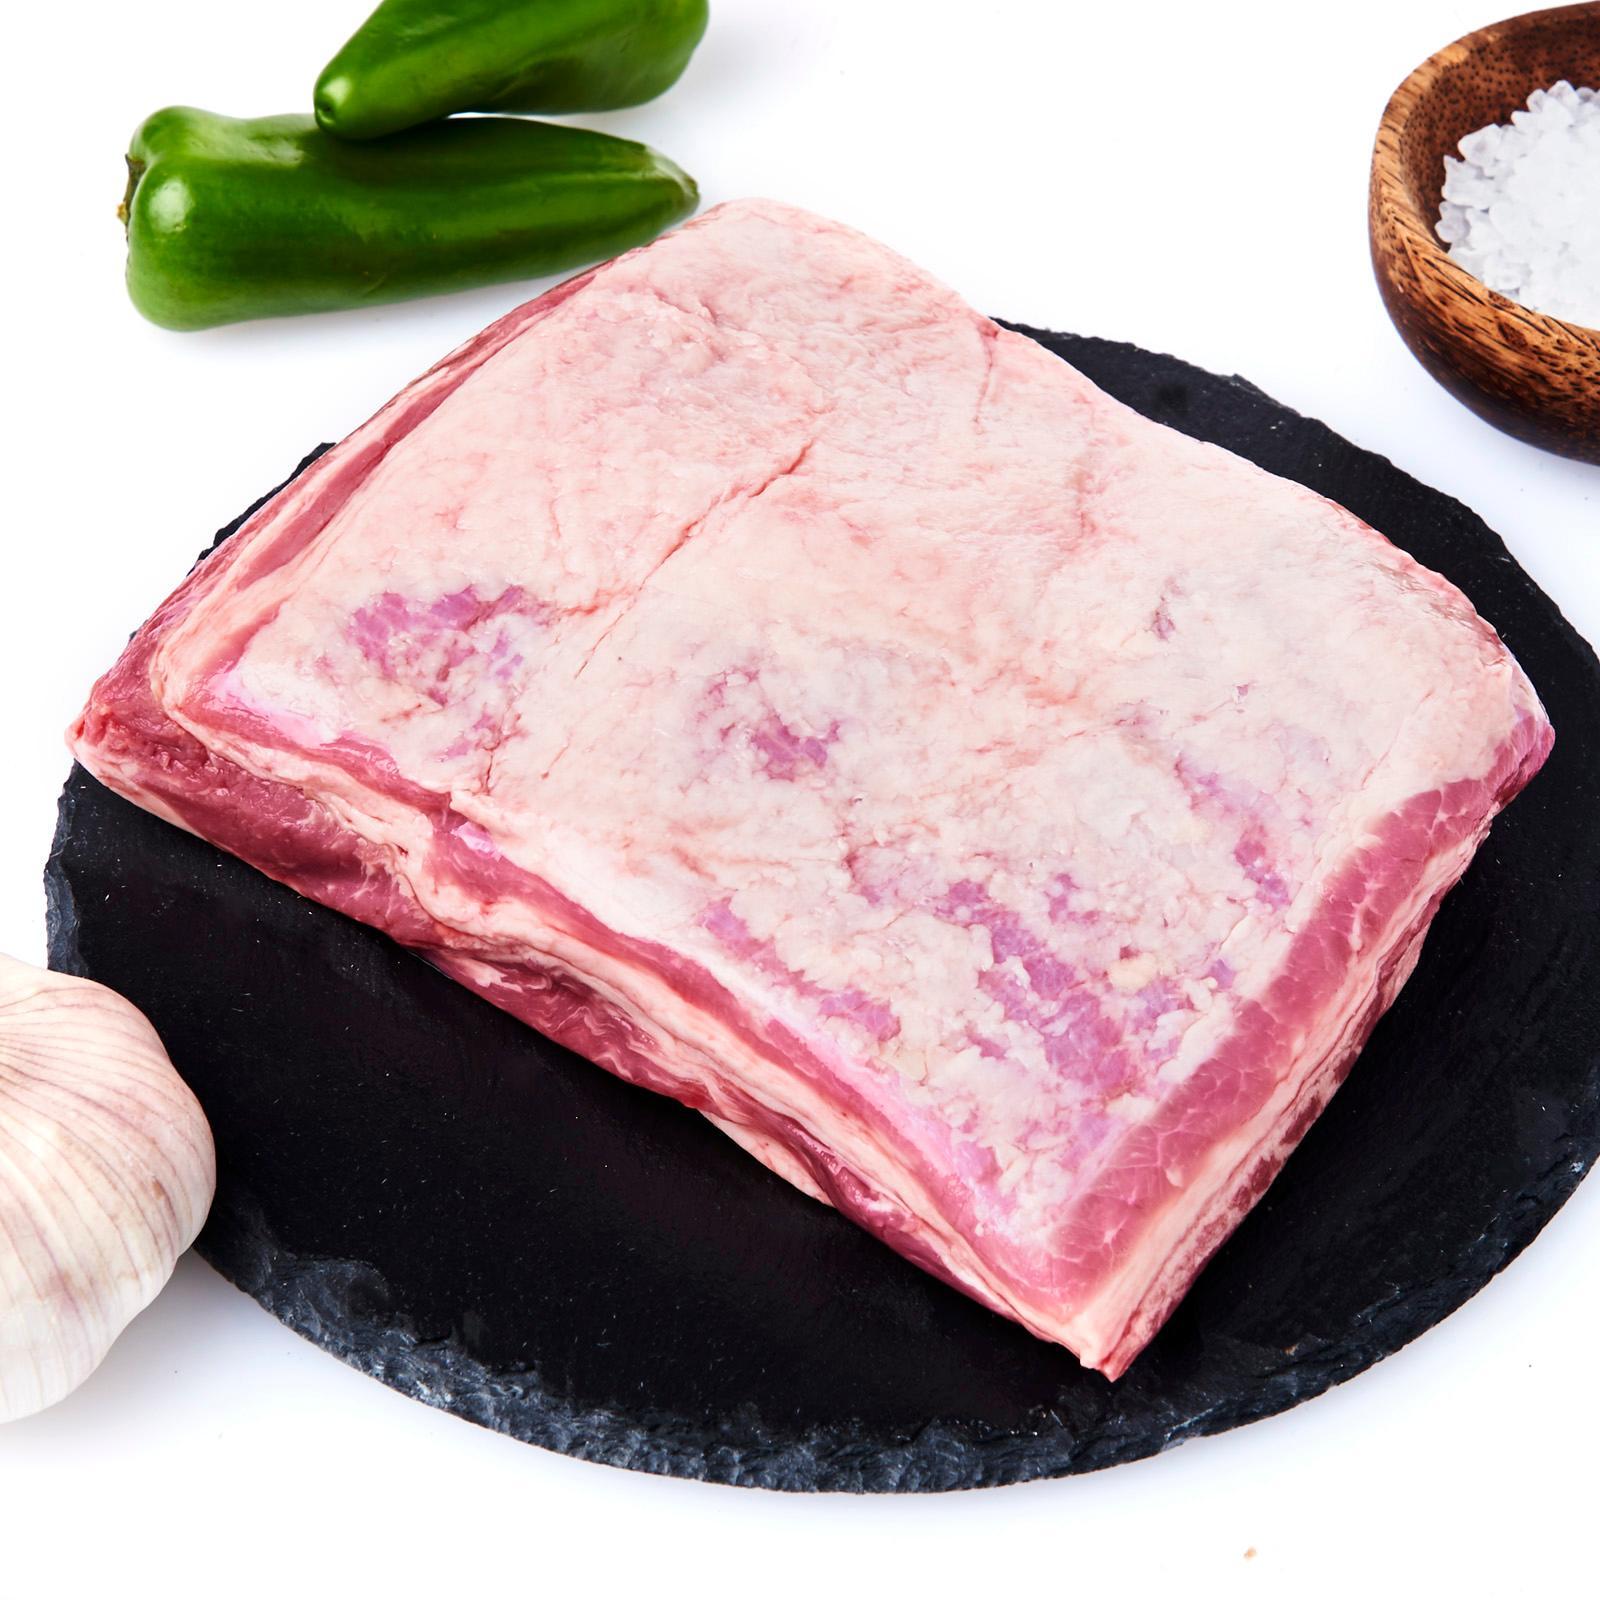 Meat Co. Pasture Fed Australian Beef Brisket